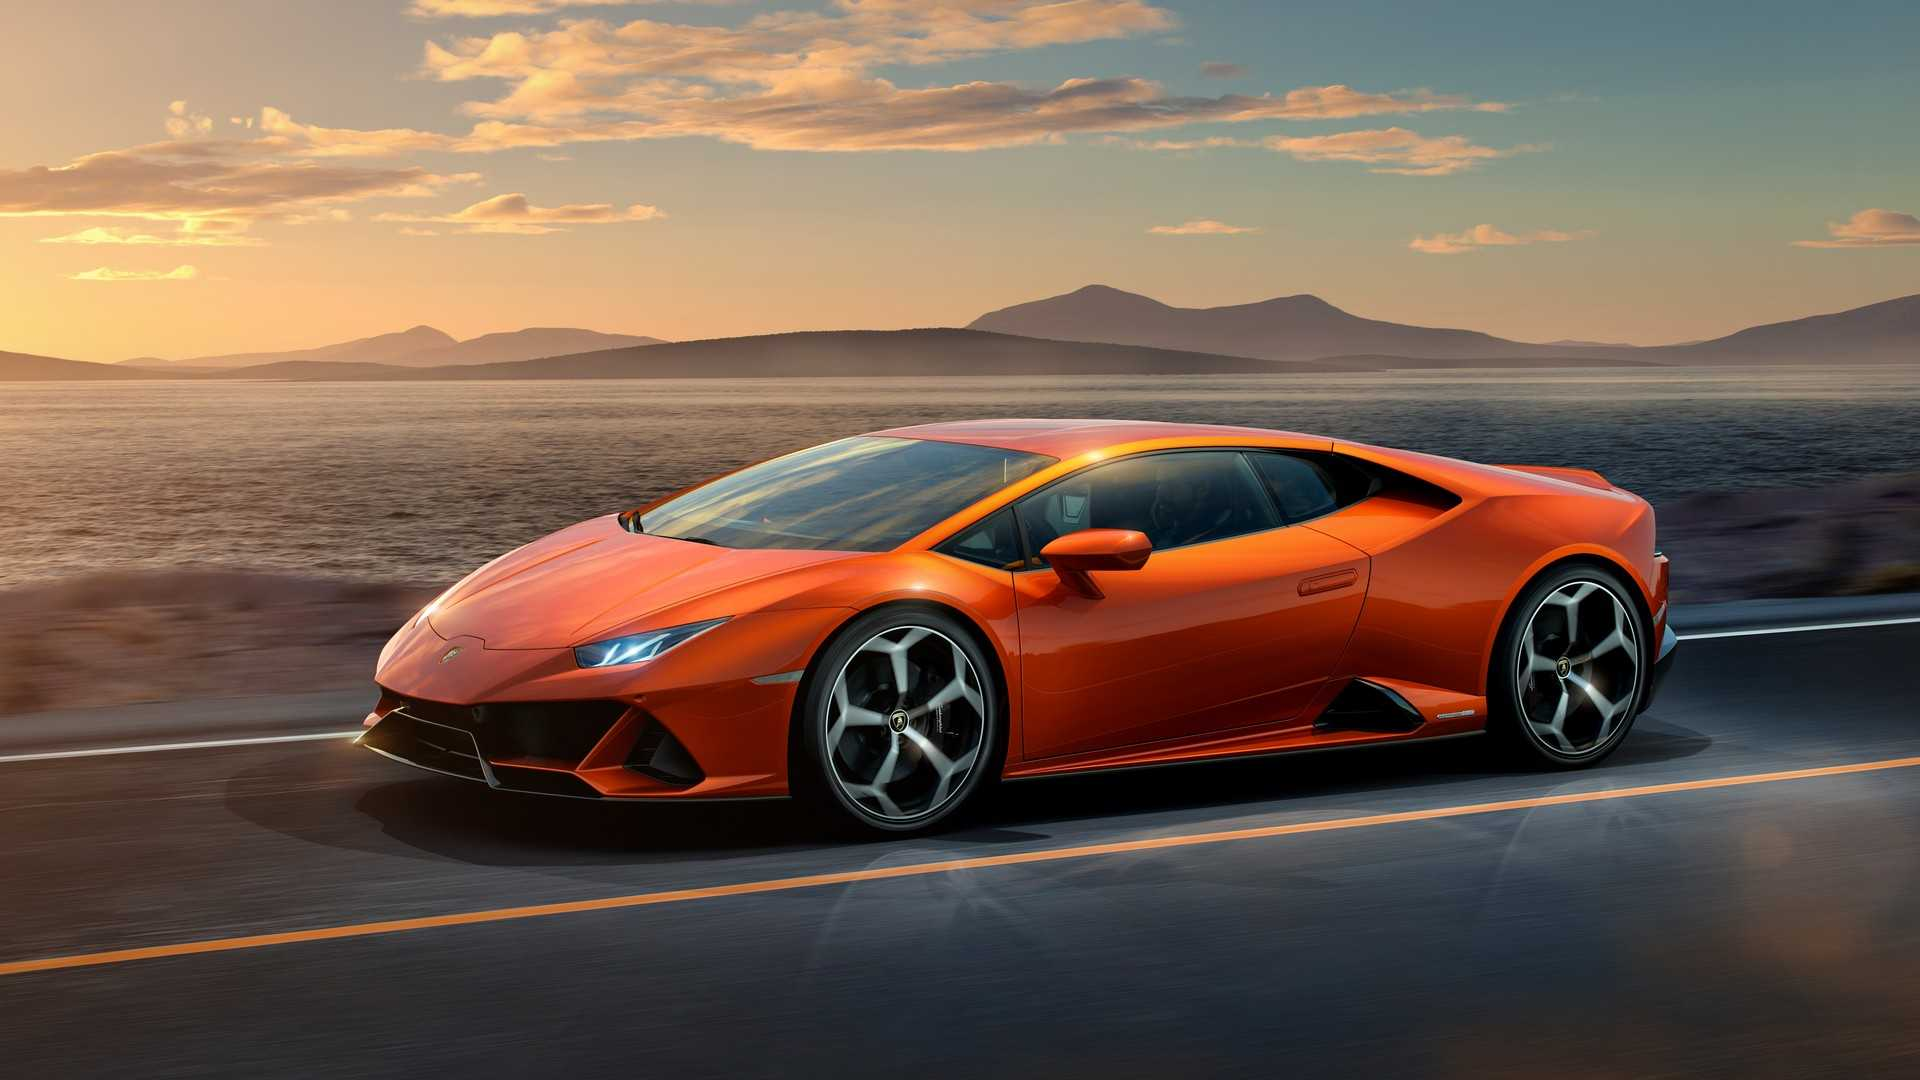 2020 Lamborghini Huracan Rumors